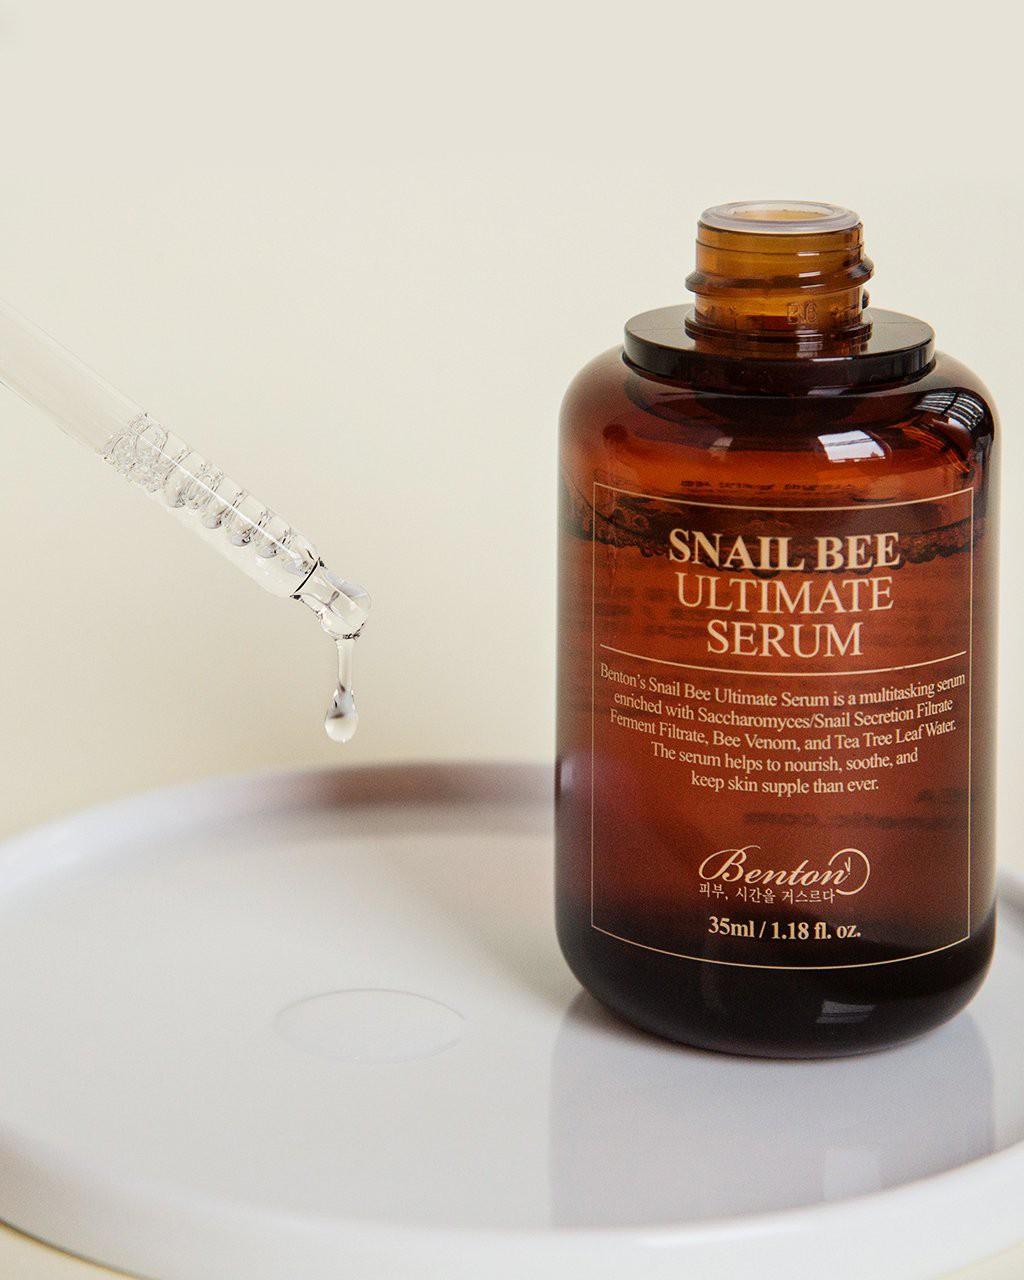 benton_snail_bee_ultimate_serum_pdp_1